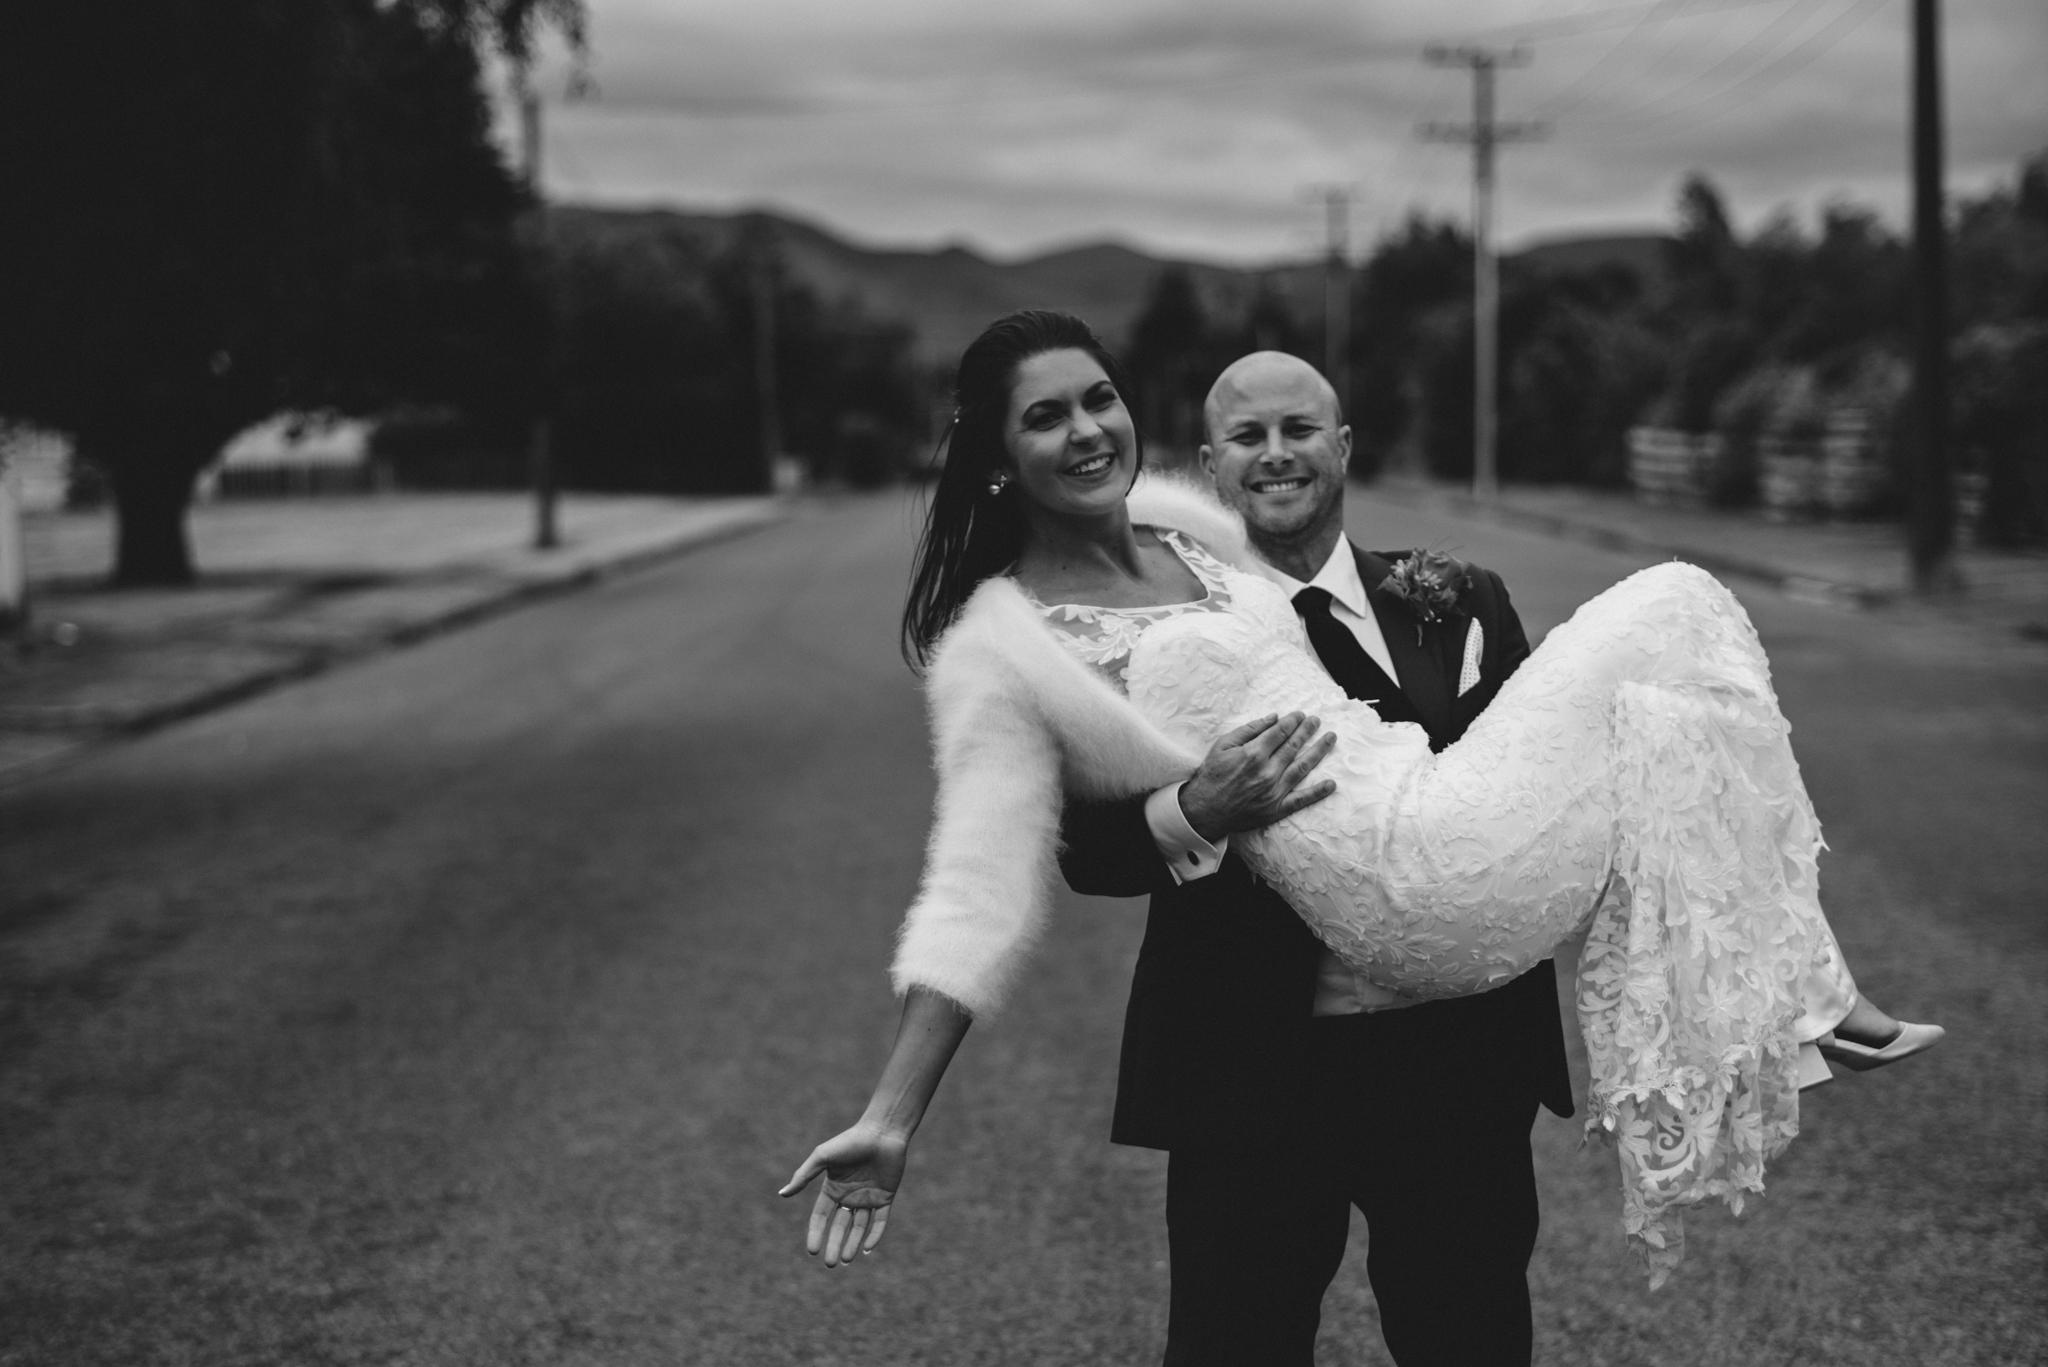 LOVELENSCAPES PHOTOGRAPHY • VISUAL POETRY • NEW ZEALAND WEDDING PHOTOGRAPHER • AUSTRALIAN WEDDING PHOTOGRAPHER • BRISBANE • MELBOURNE • SYDNEY • HOBART • TARUREKA ESTATE • ANNA CAMPBELL • 144.jpg